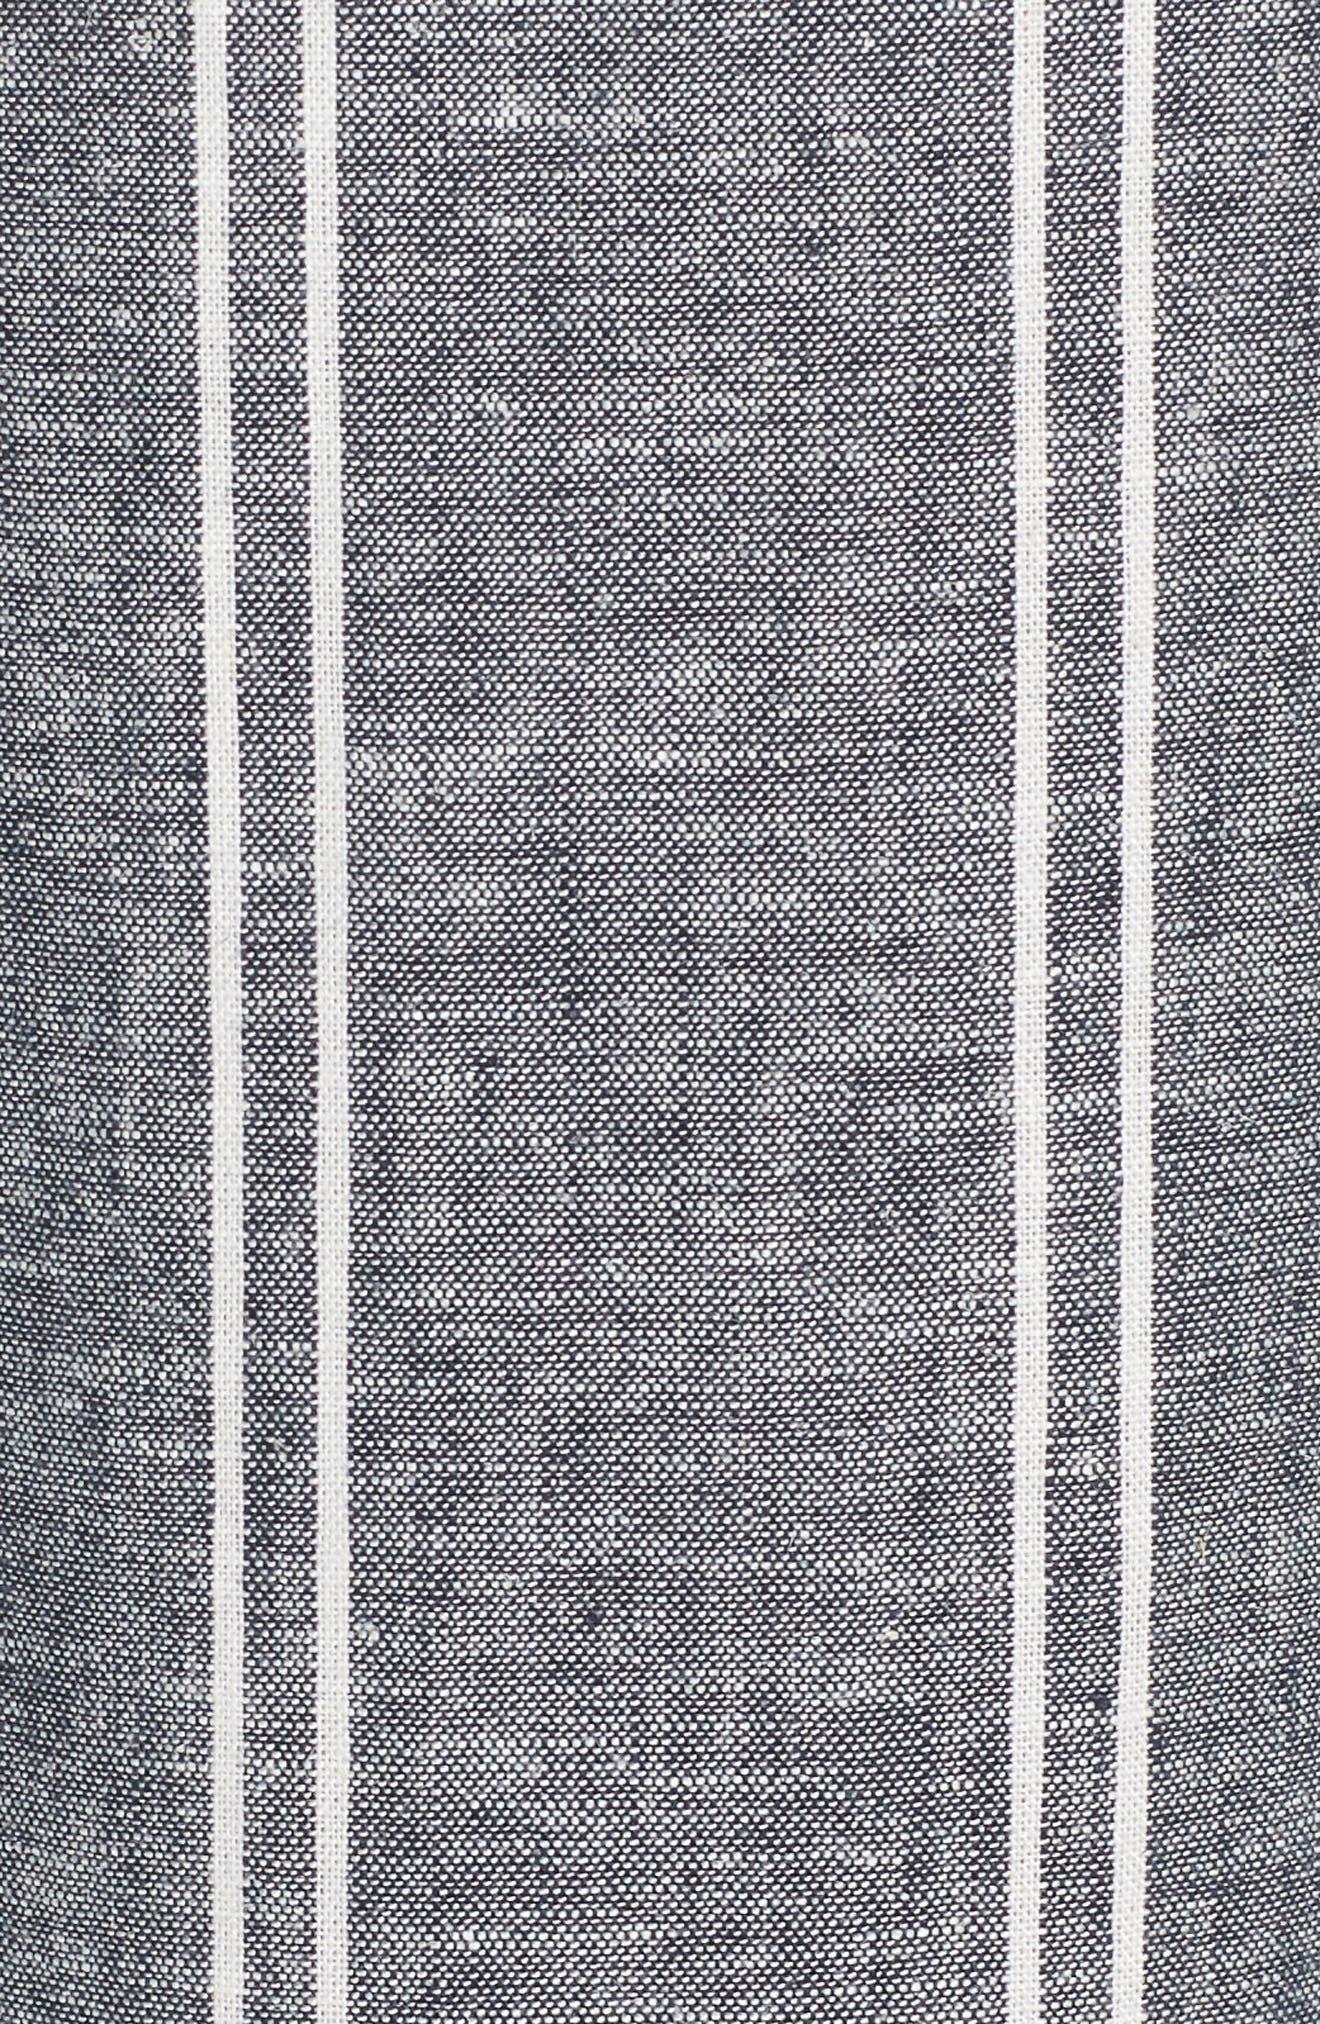 Stripe Linen Blend Culottes,                             Alternate thumbnail 6, color,                             Navy Peacoat Chambray Stripe